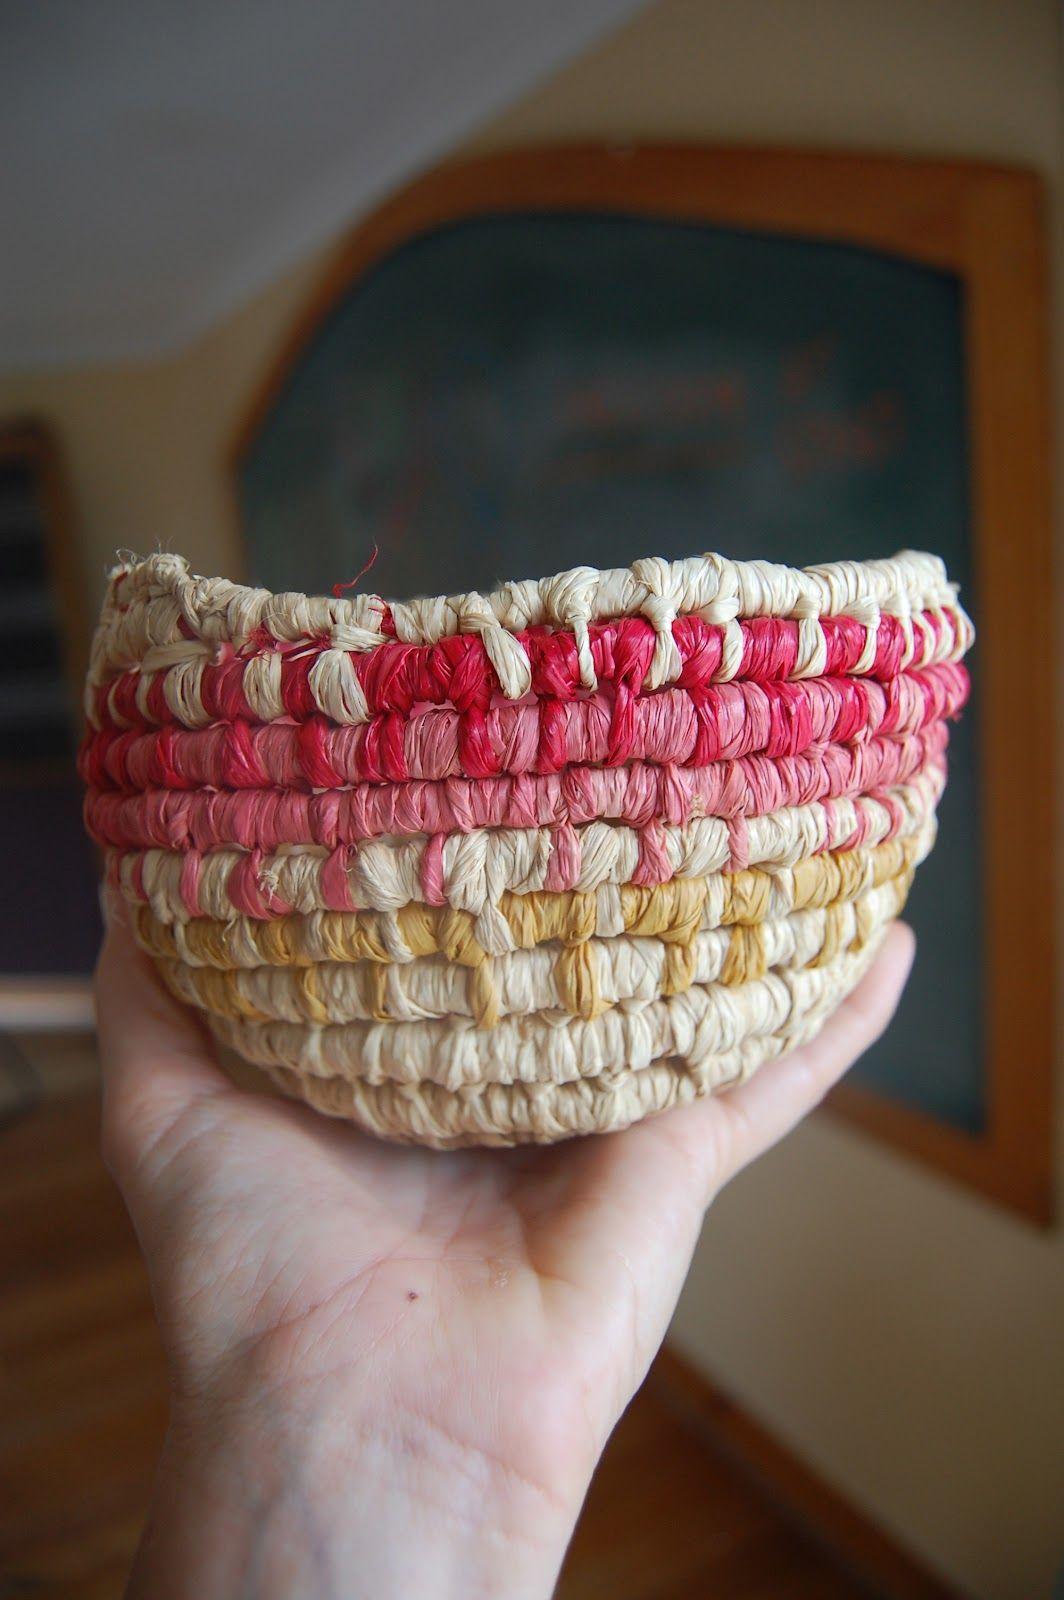 Weaving baskets from plastic bottles: master class 7